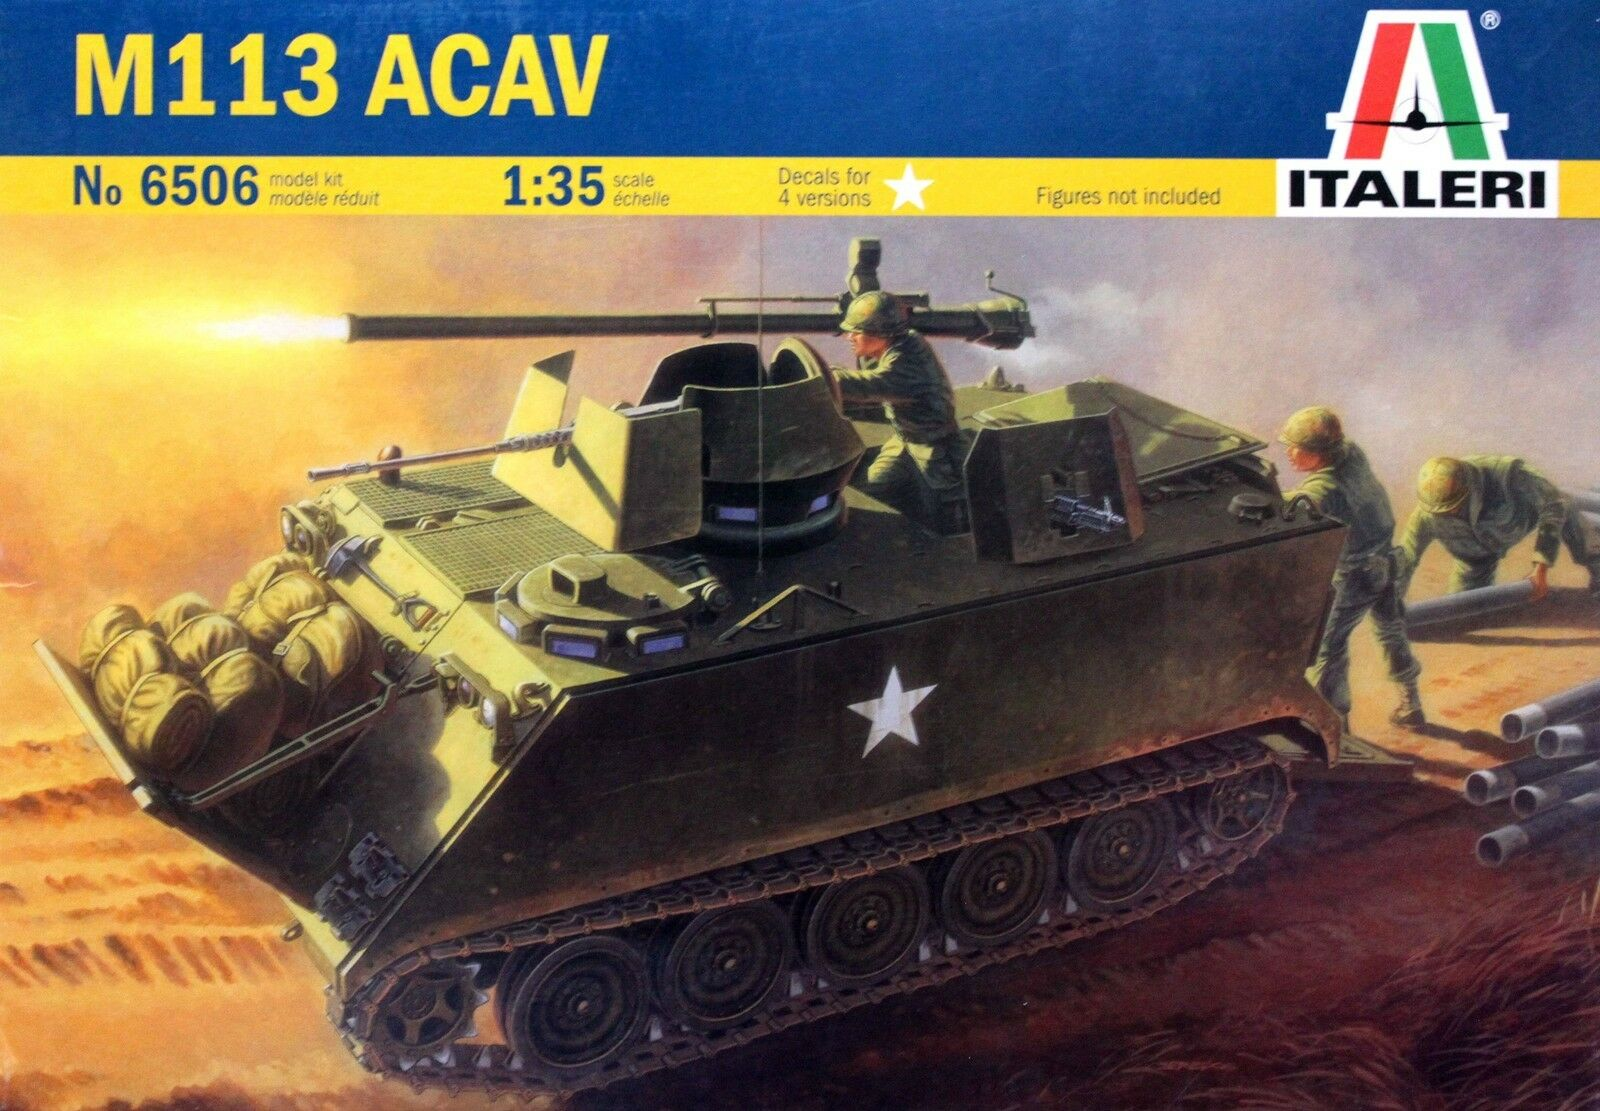 Italeri 1 35 6506 US M113 ACAV Armored Cavalry Assault Vehicle (Vietnam War)